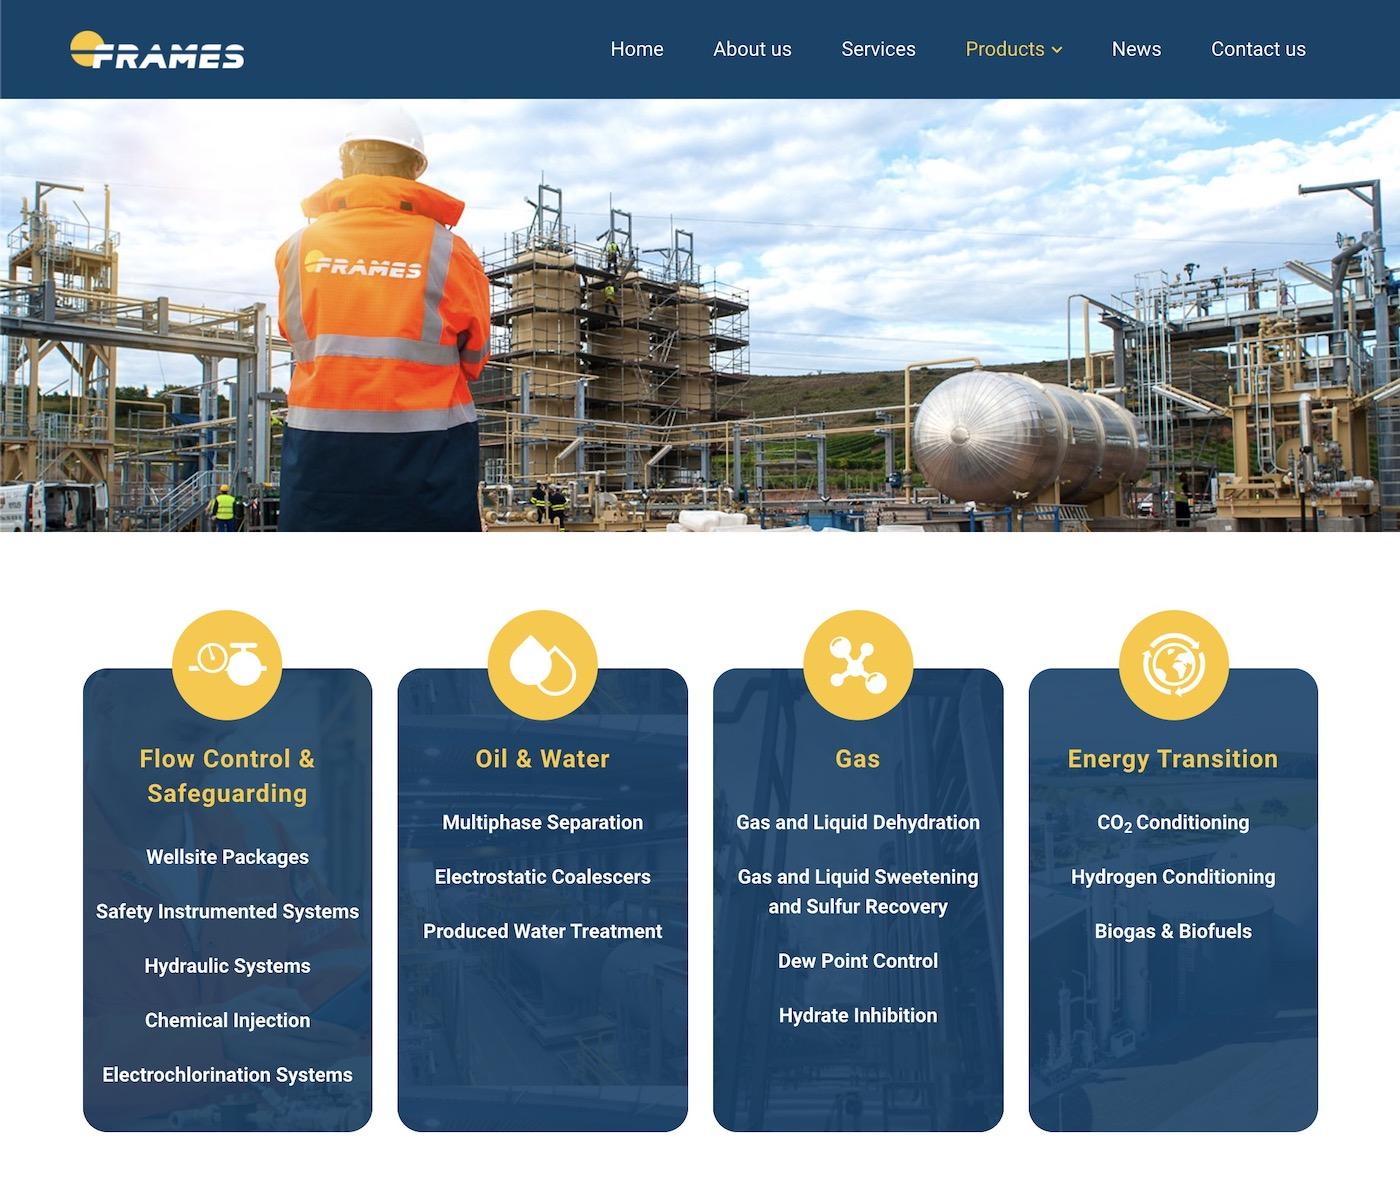 frames-group.com-corporate-wordpress-website-development-work-in-netherland-europe-products